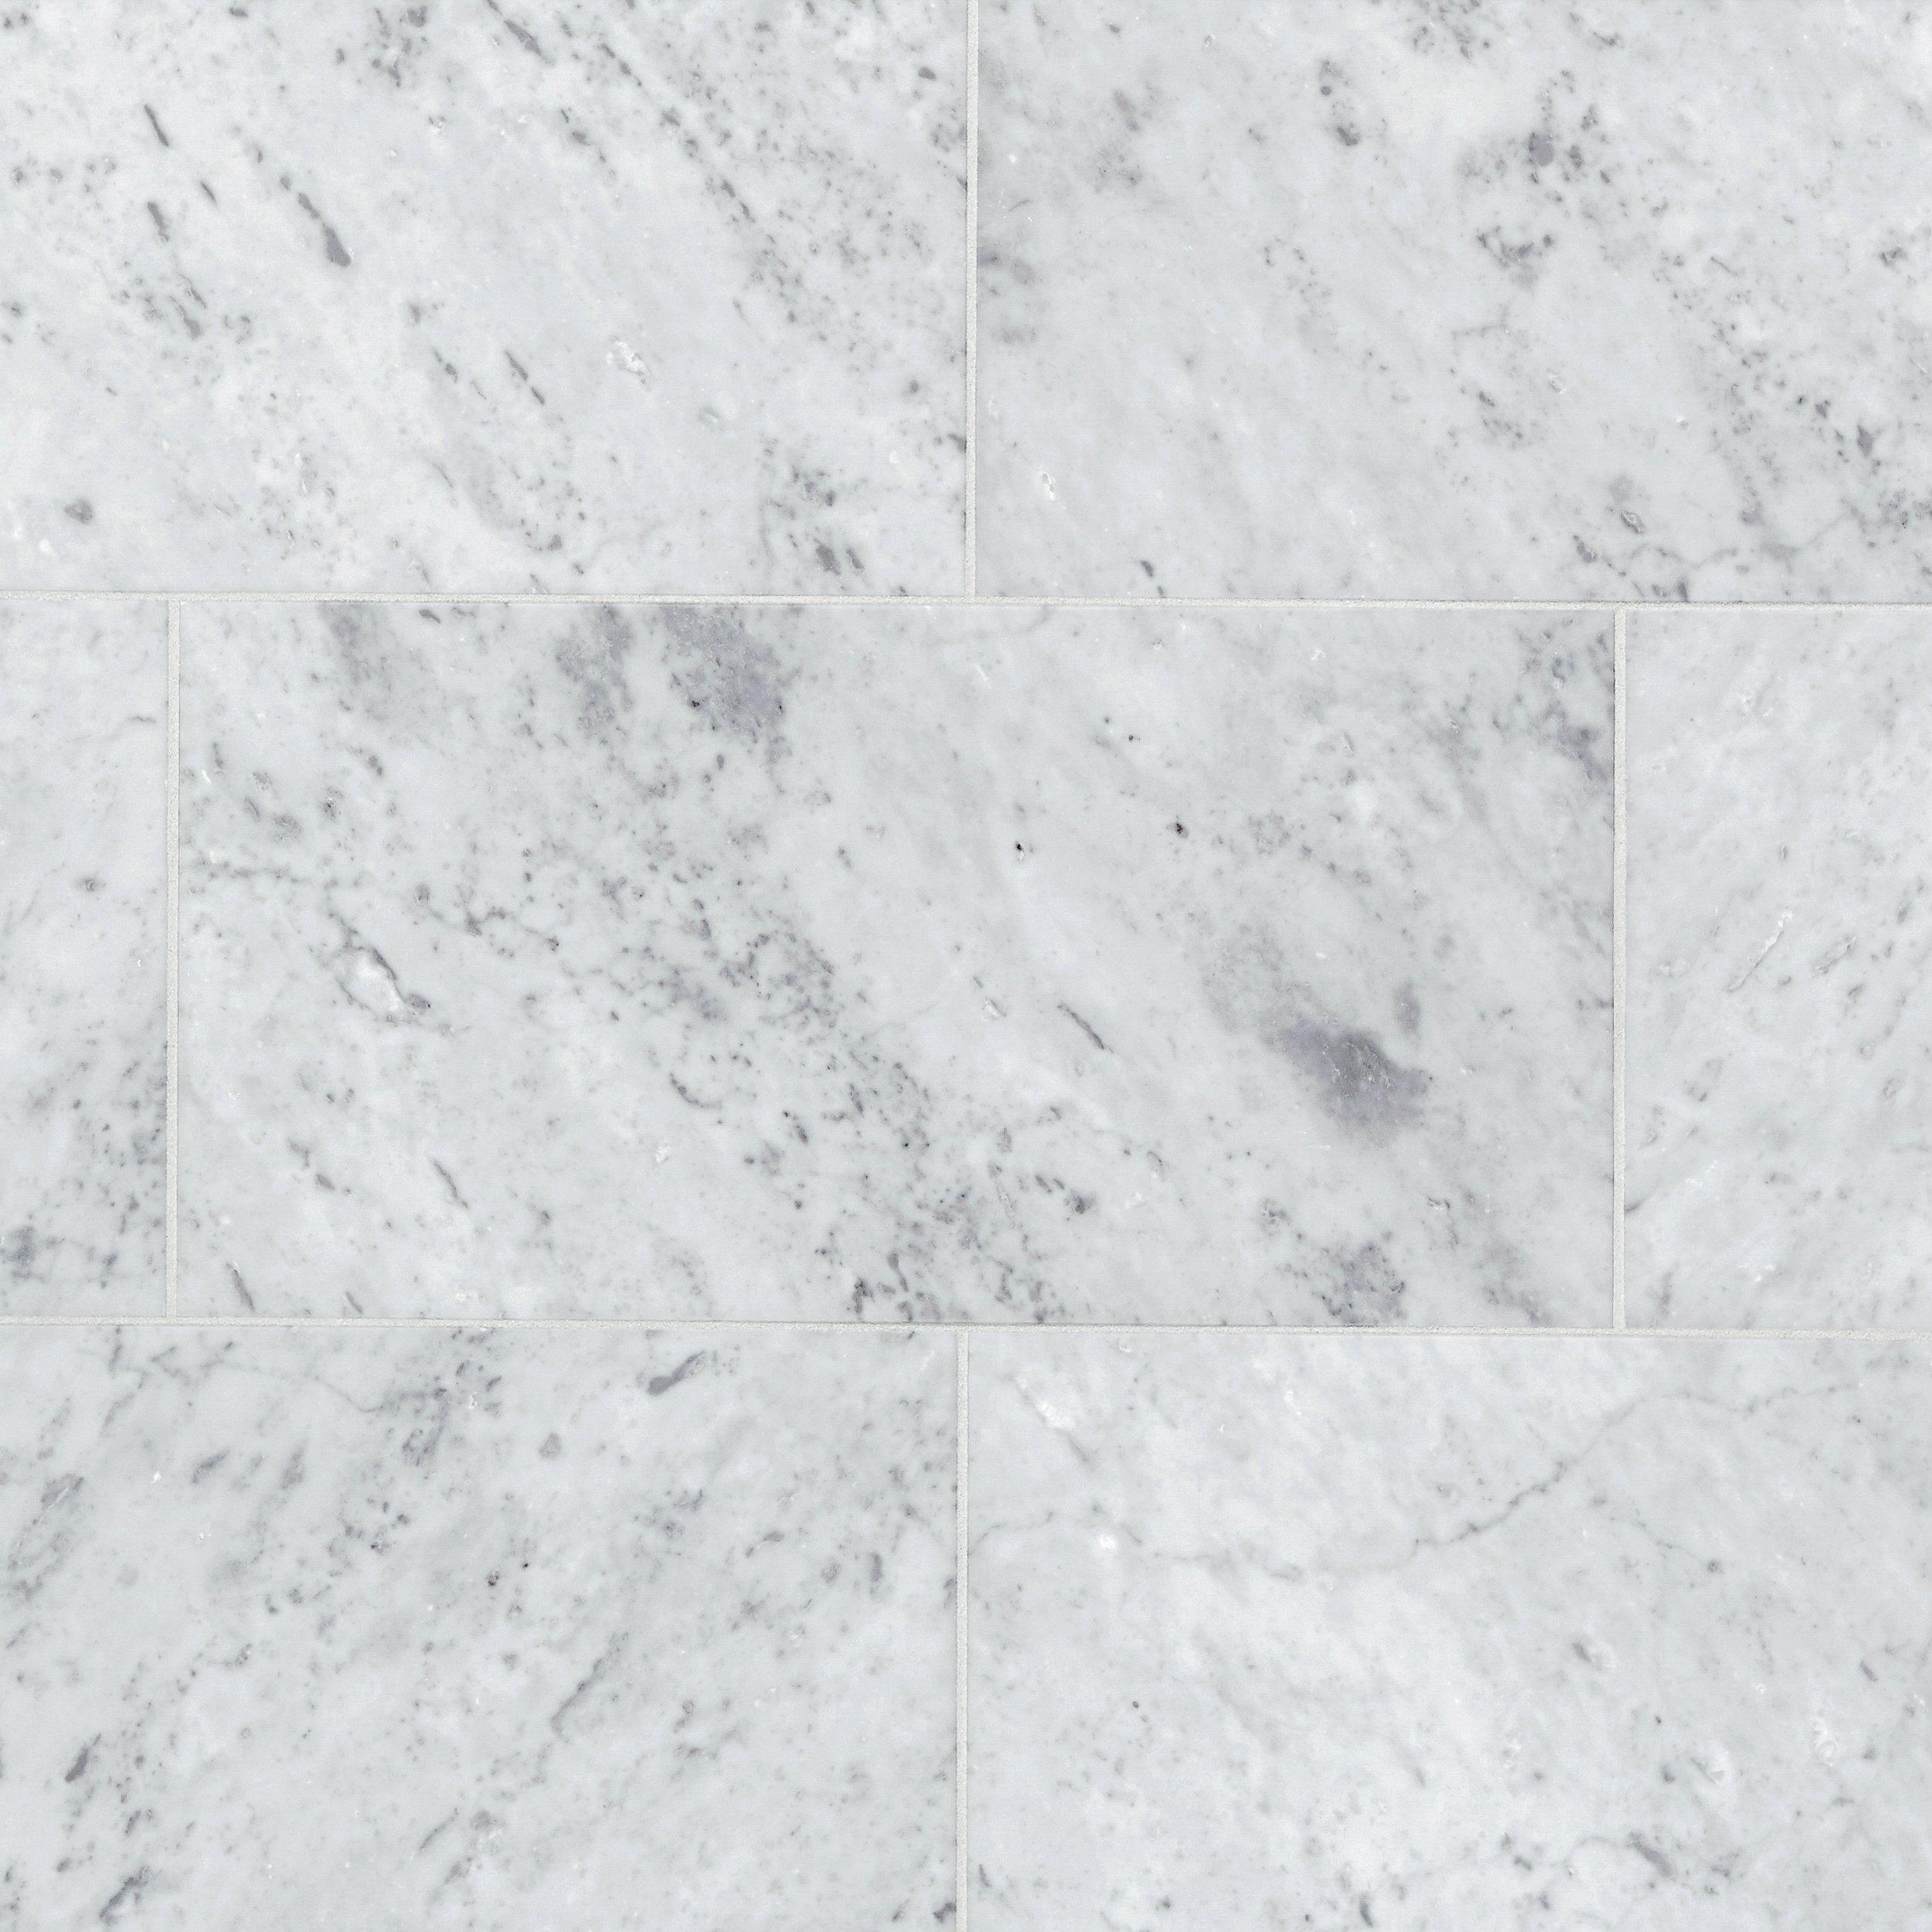 Bianco Carrara Honed Marble Tile 12 X 24 100100981 Floor And Decor